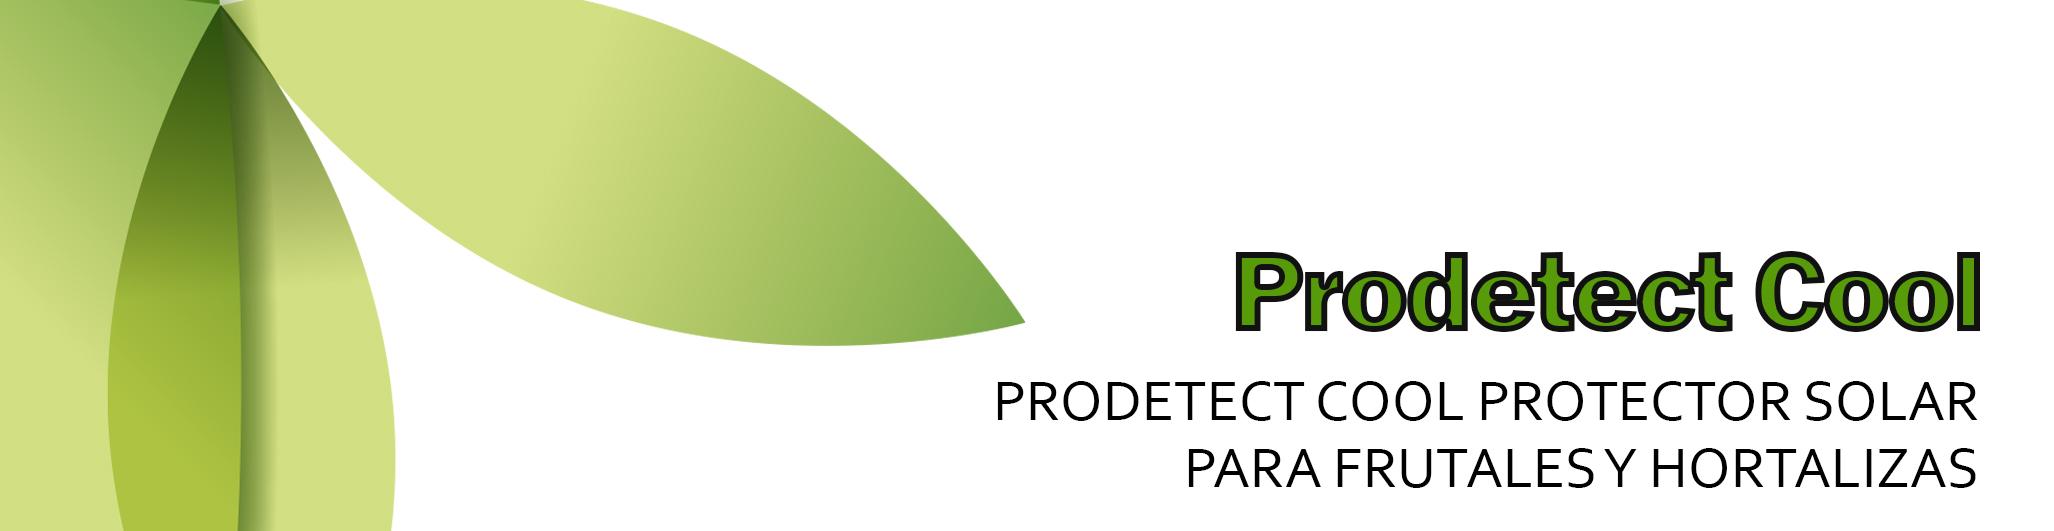 Prodetect Cool